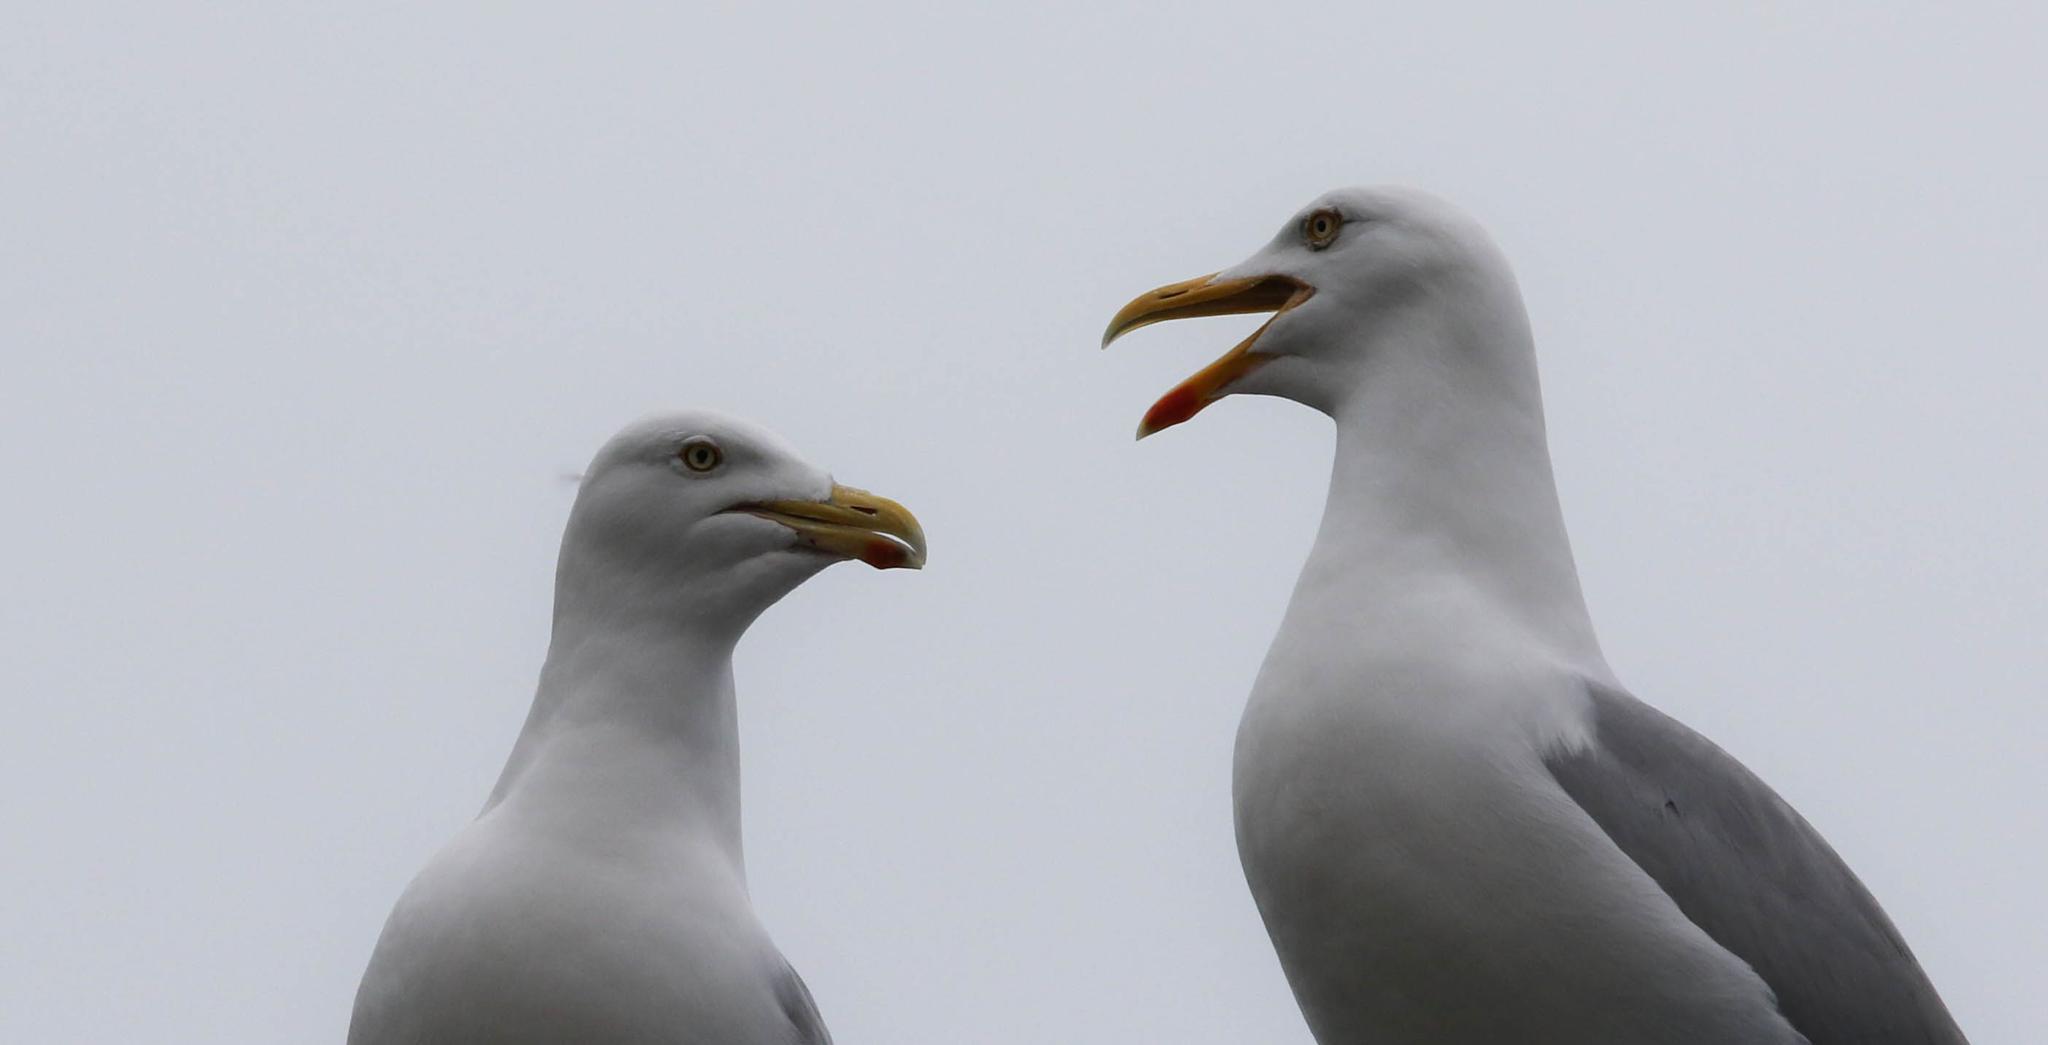 Gull by emmanuel liegeois